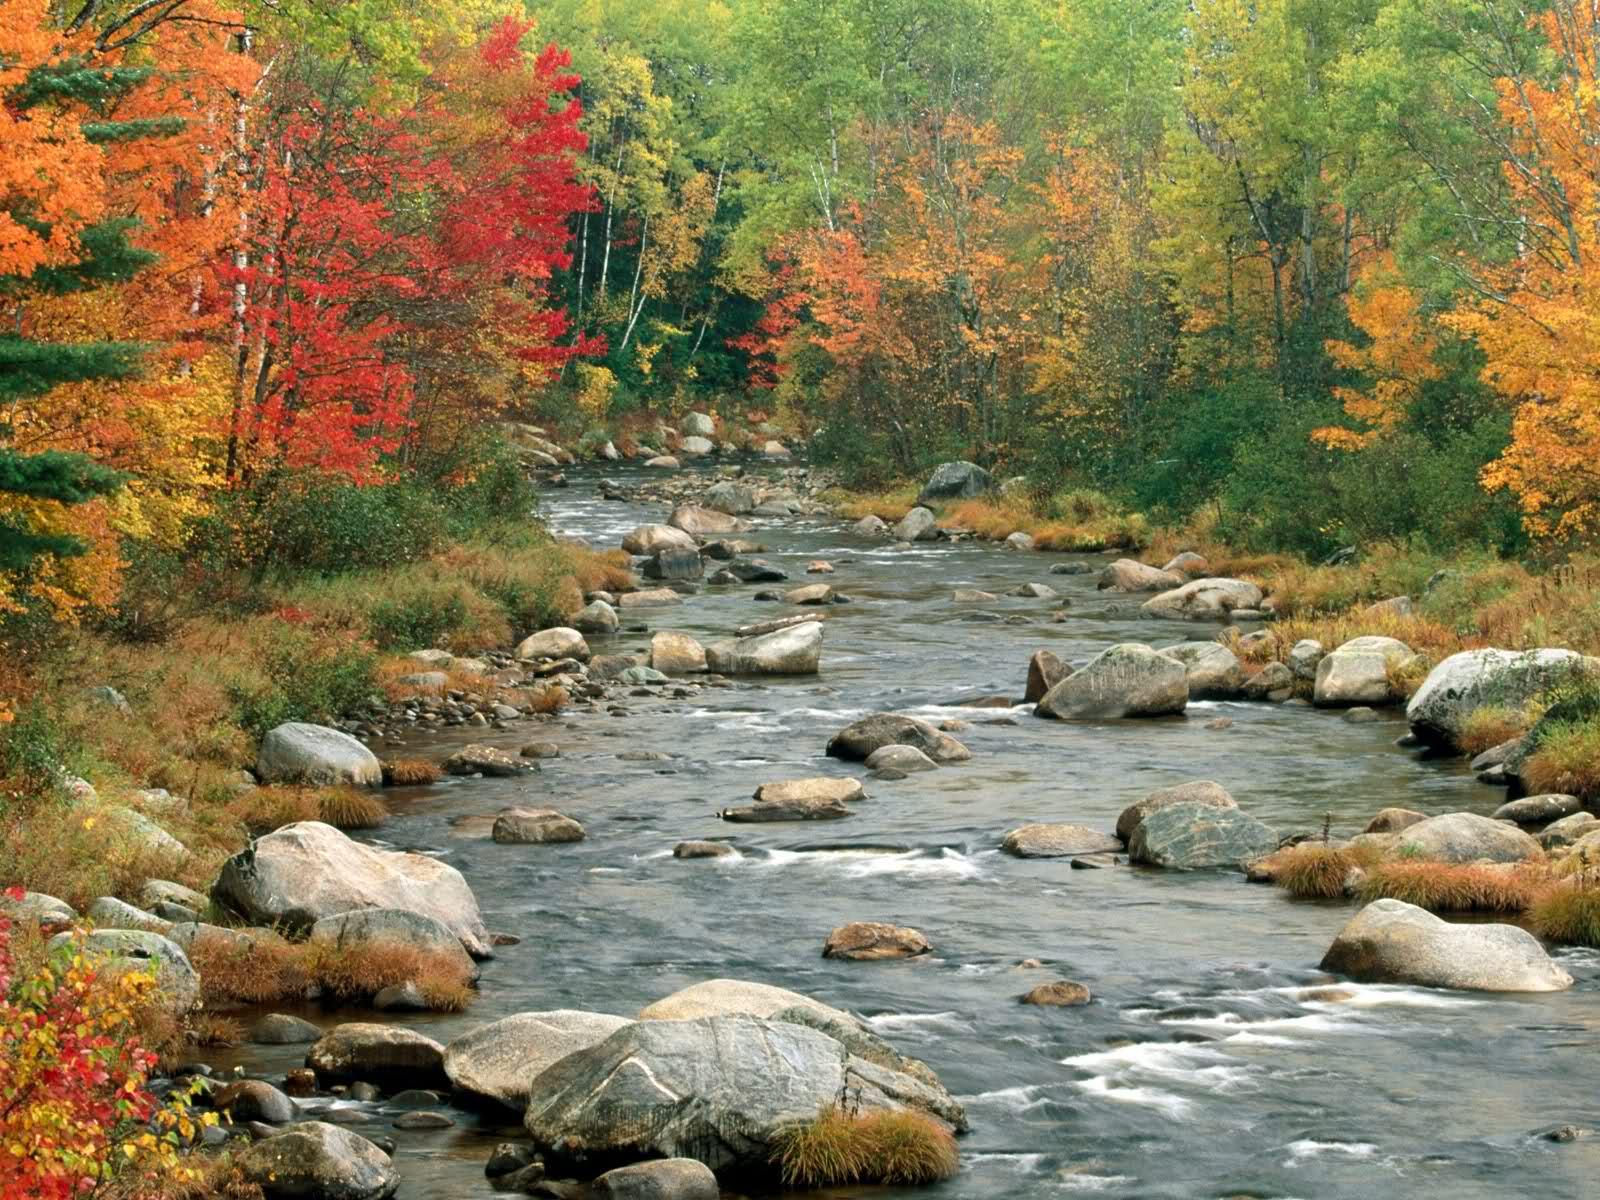 autumn nature river - photo #1